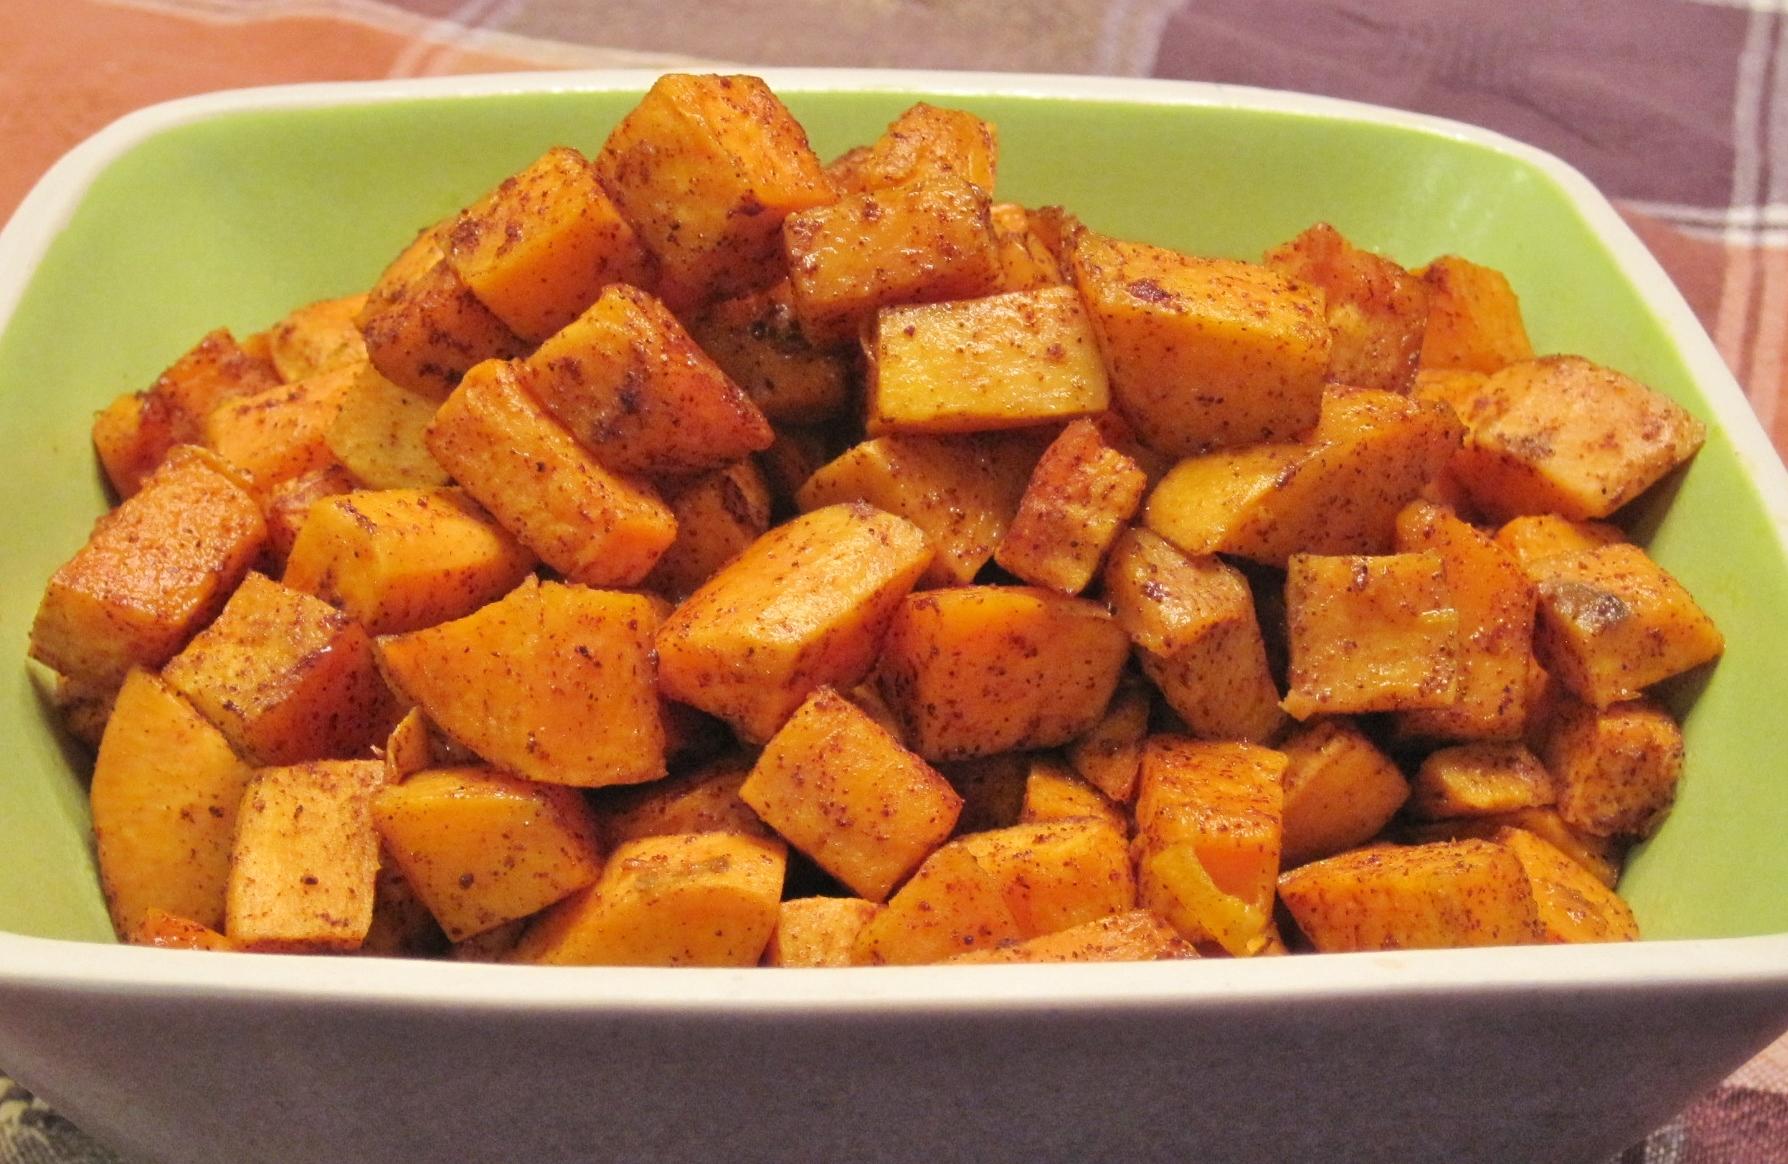 Roasted Cinnamon Sweet Potatoes - Juggling with Julia